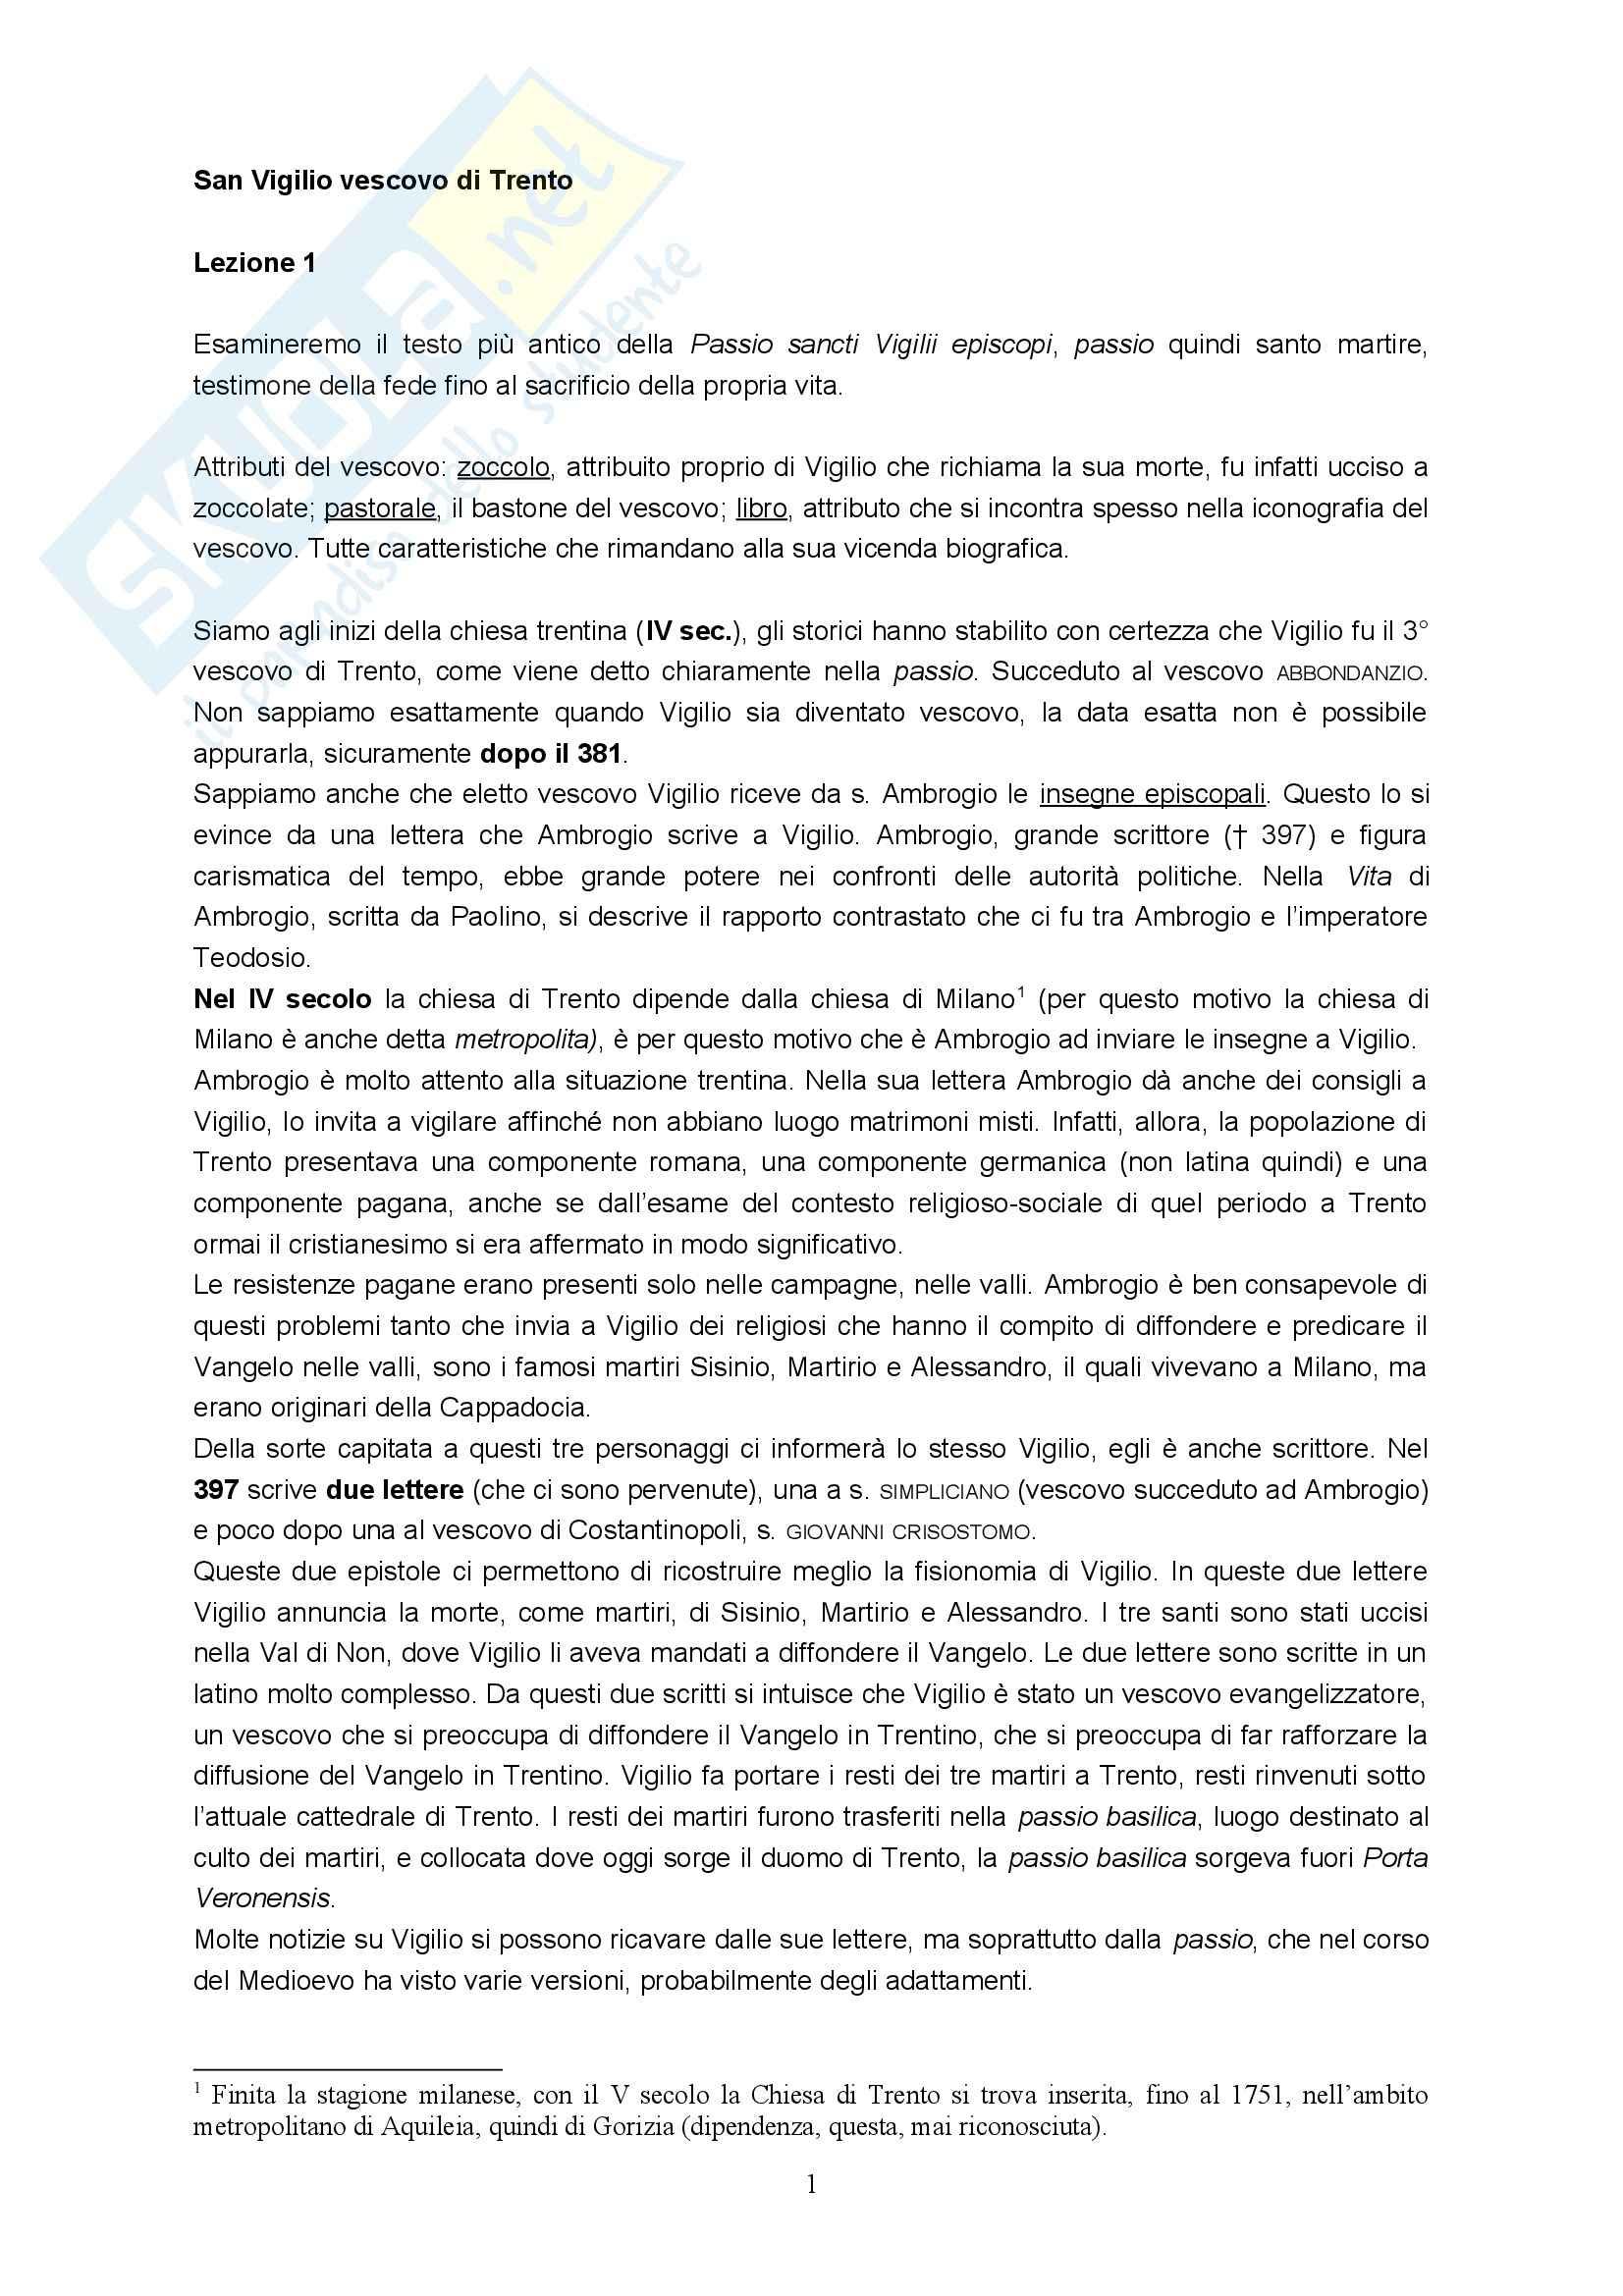 Agiografia - San Vigilio vescovo di Trento